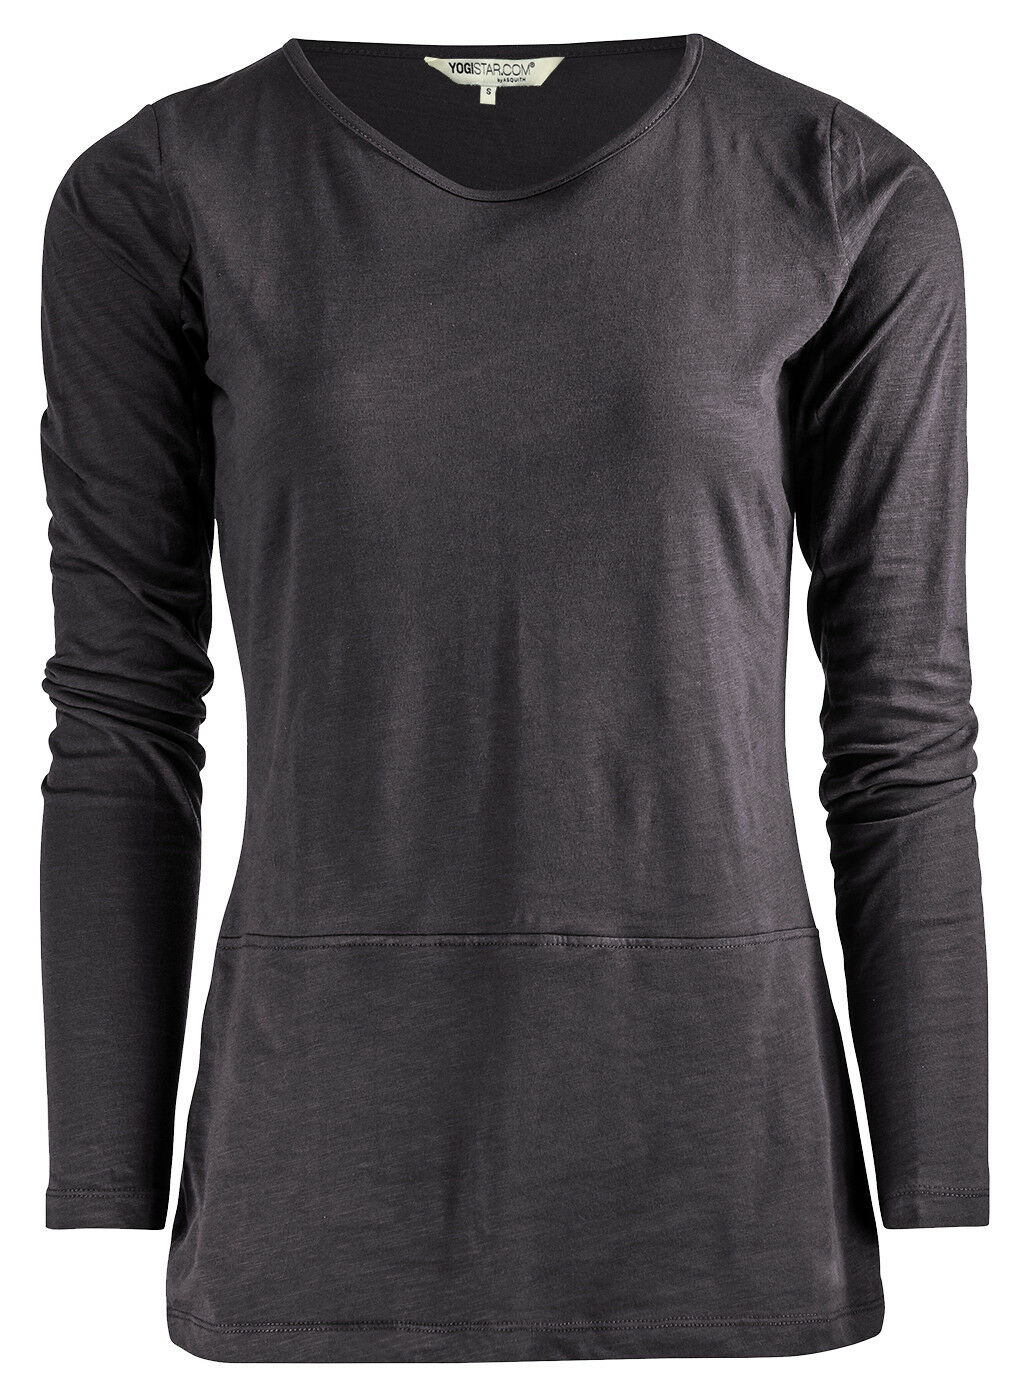 Yoga-shirt  get Down  - Soot Grau von Yogistar  | Gute Qualität